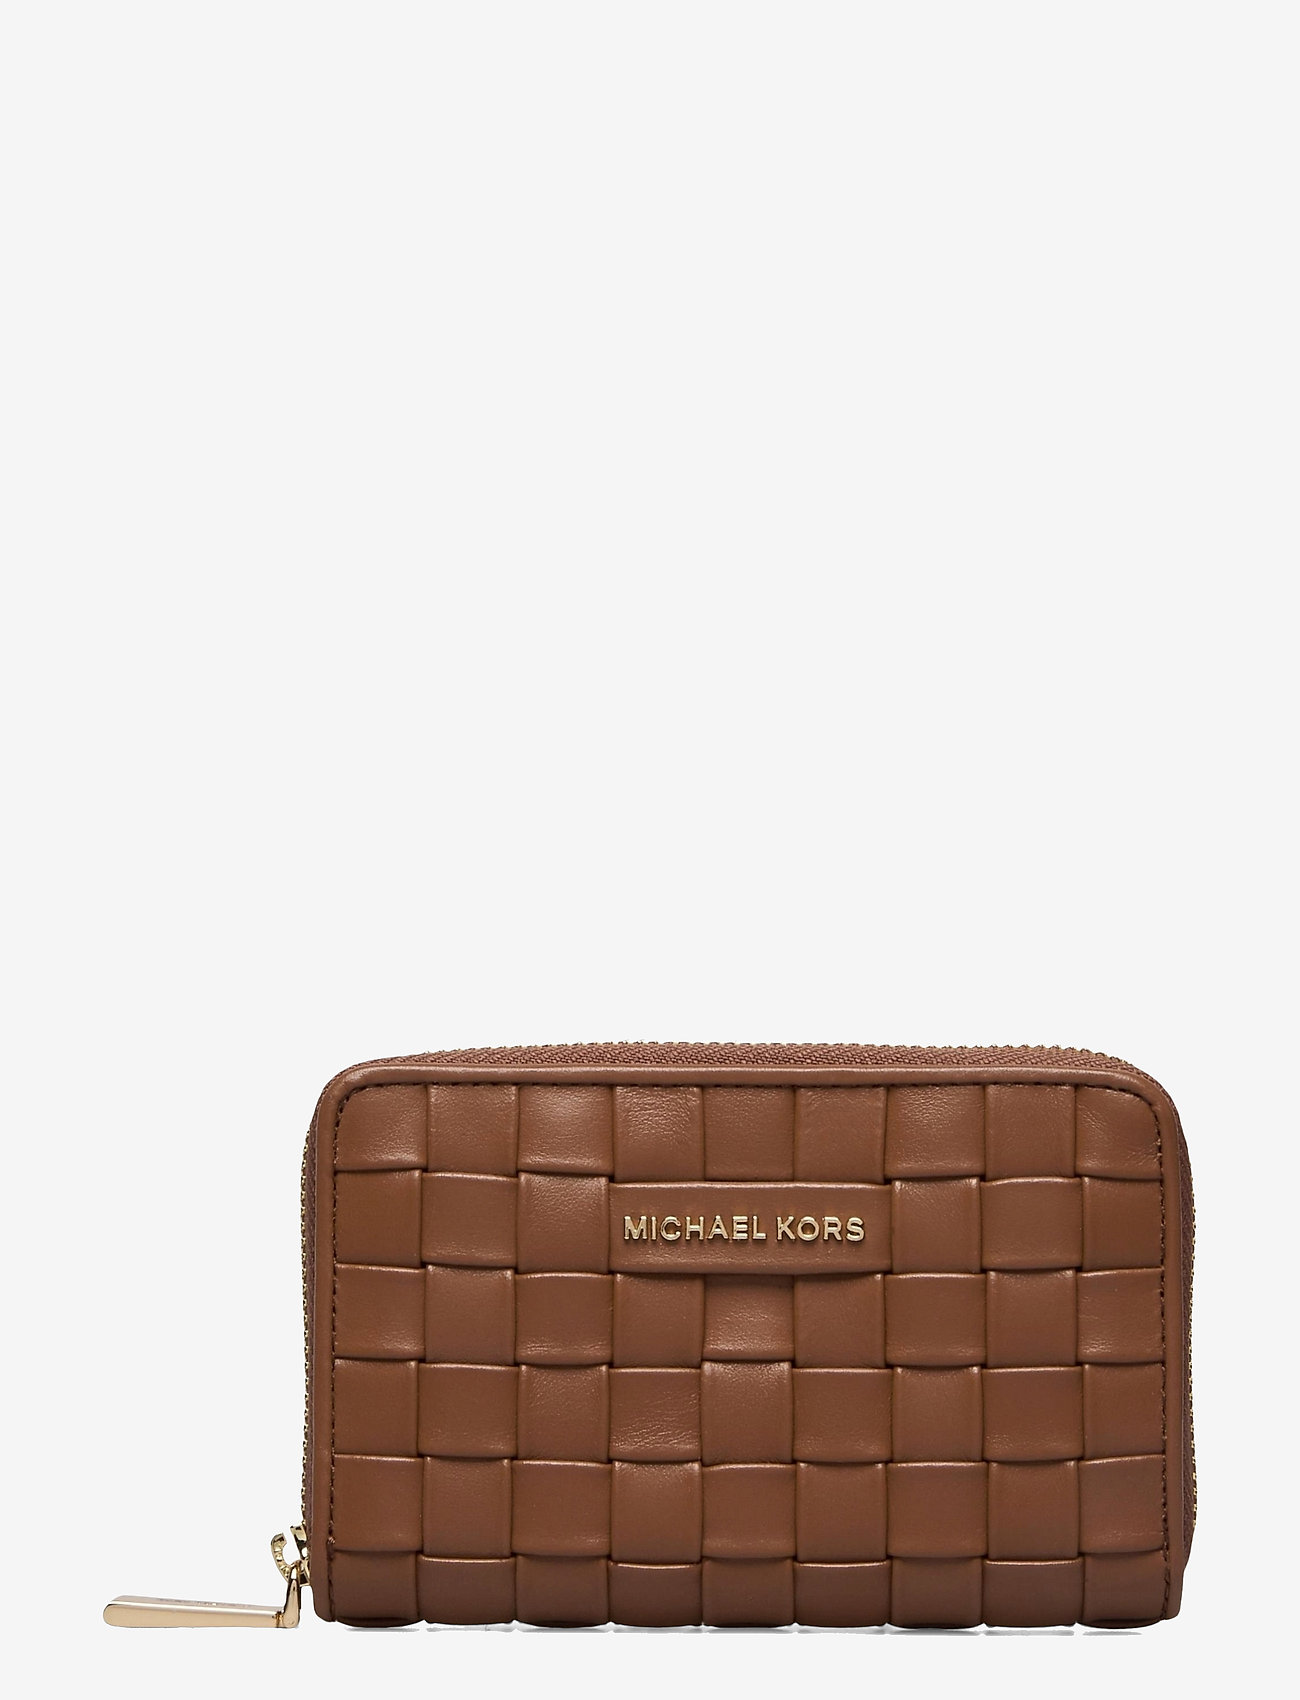 Michael Kors - SM ZA CARD CASE - kaarthouders - luggage - 0